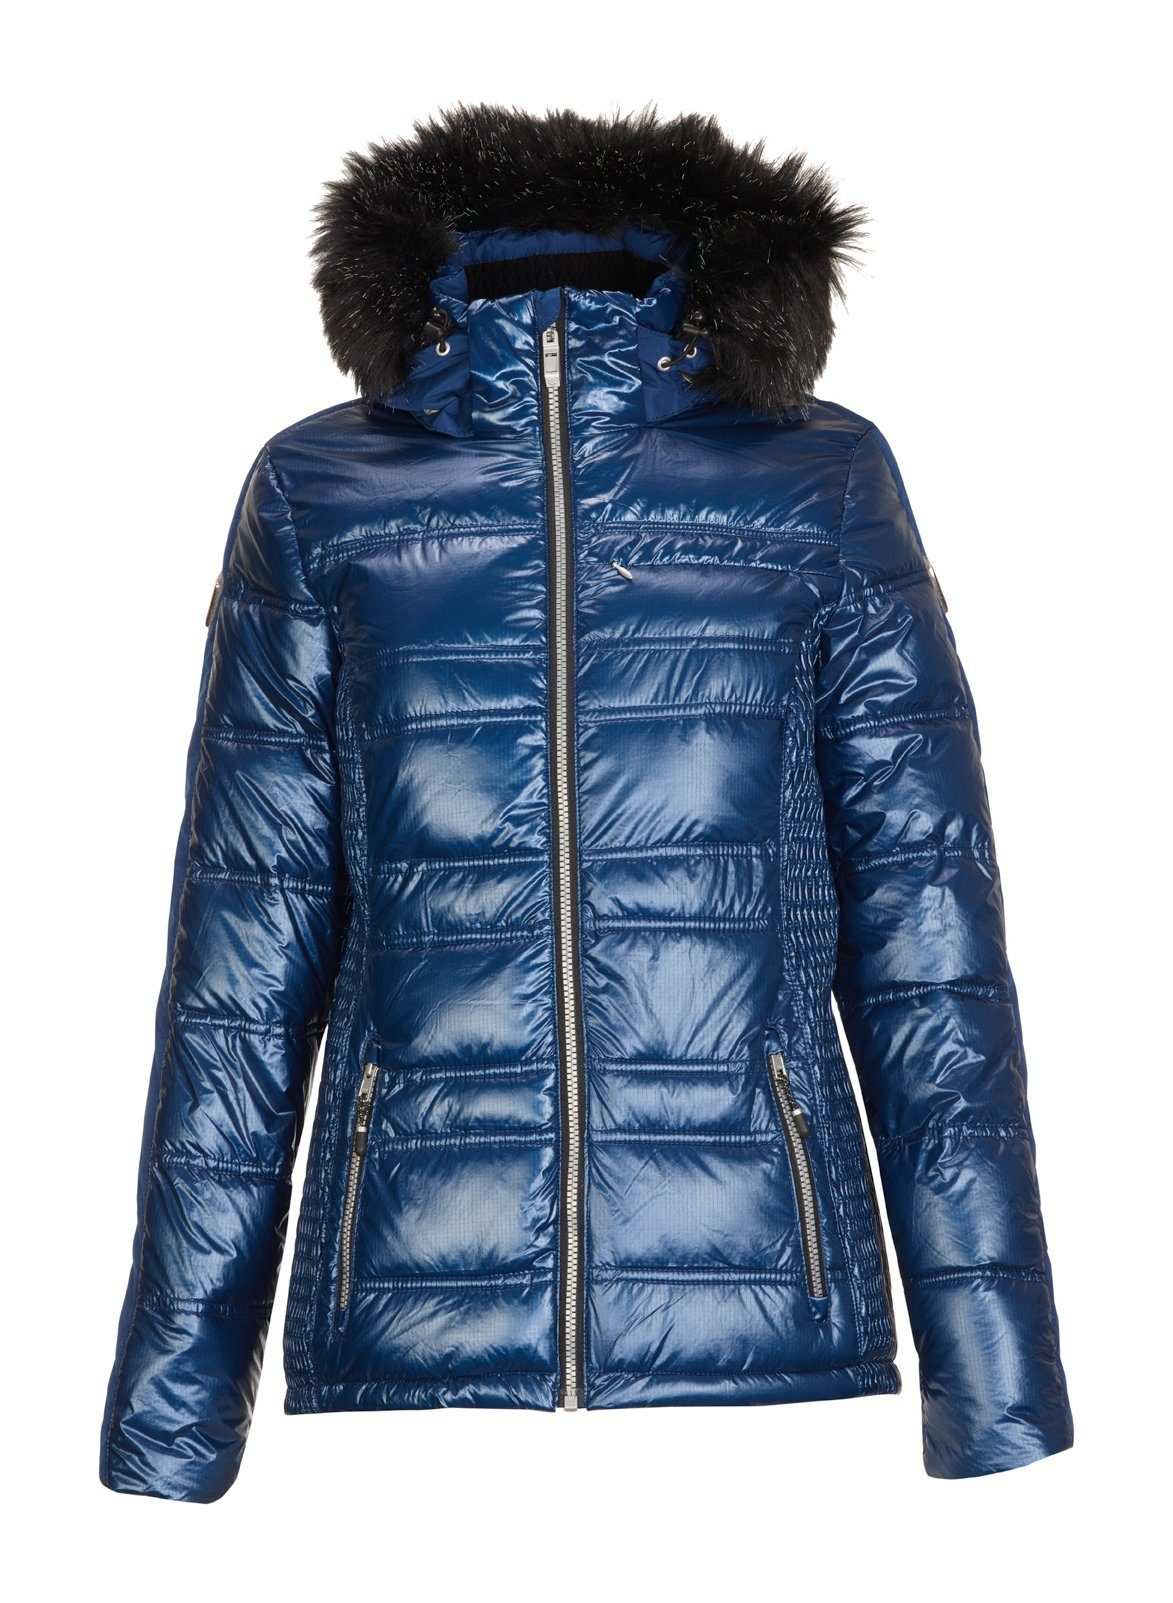 Killtec Skijacke »Mette Fashion«, Jacke in Daunenoptik online kaufen | OTTO